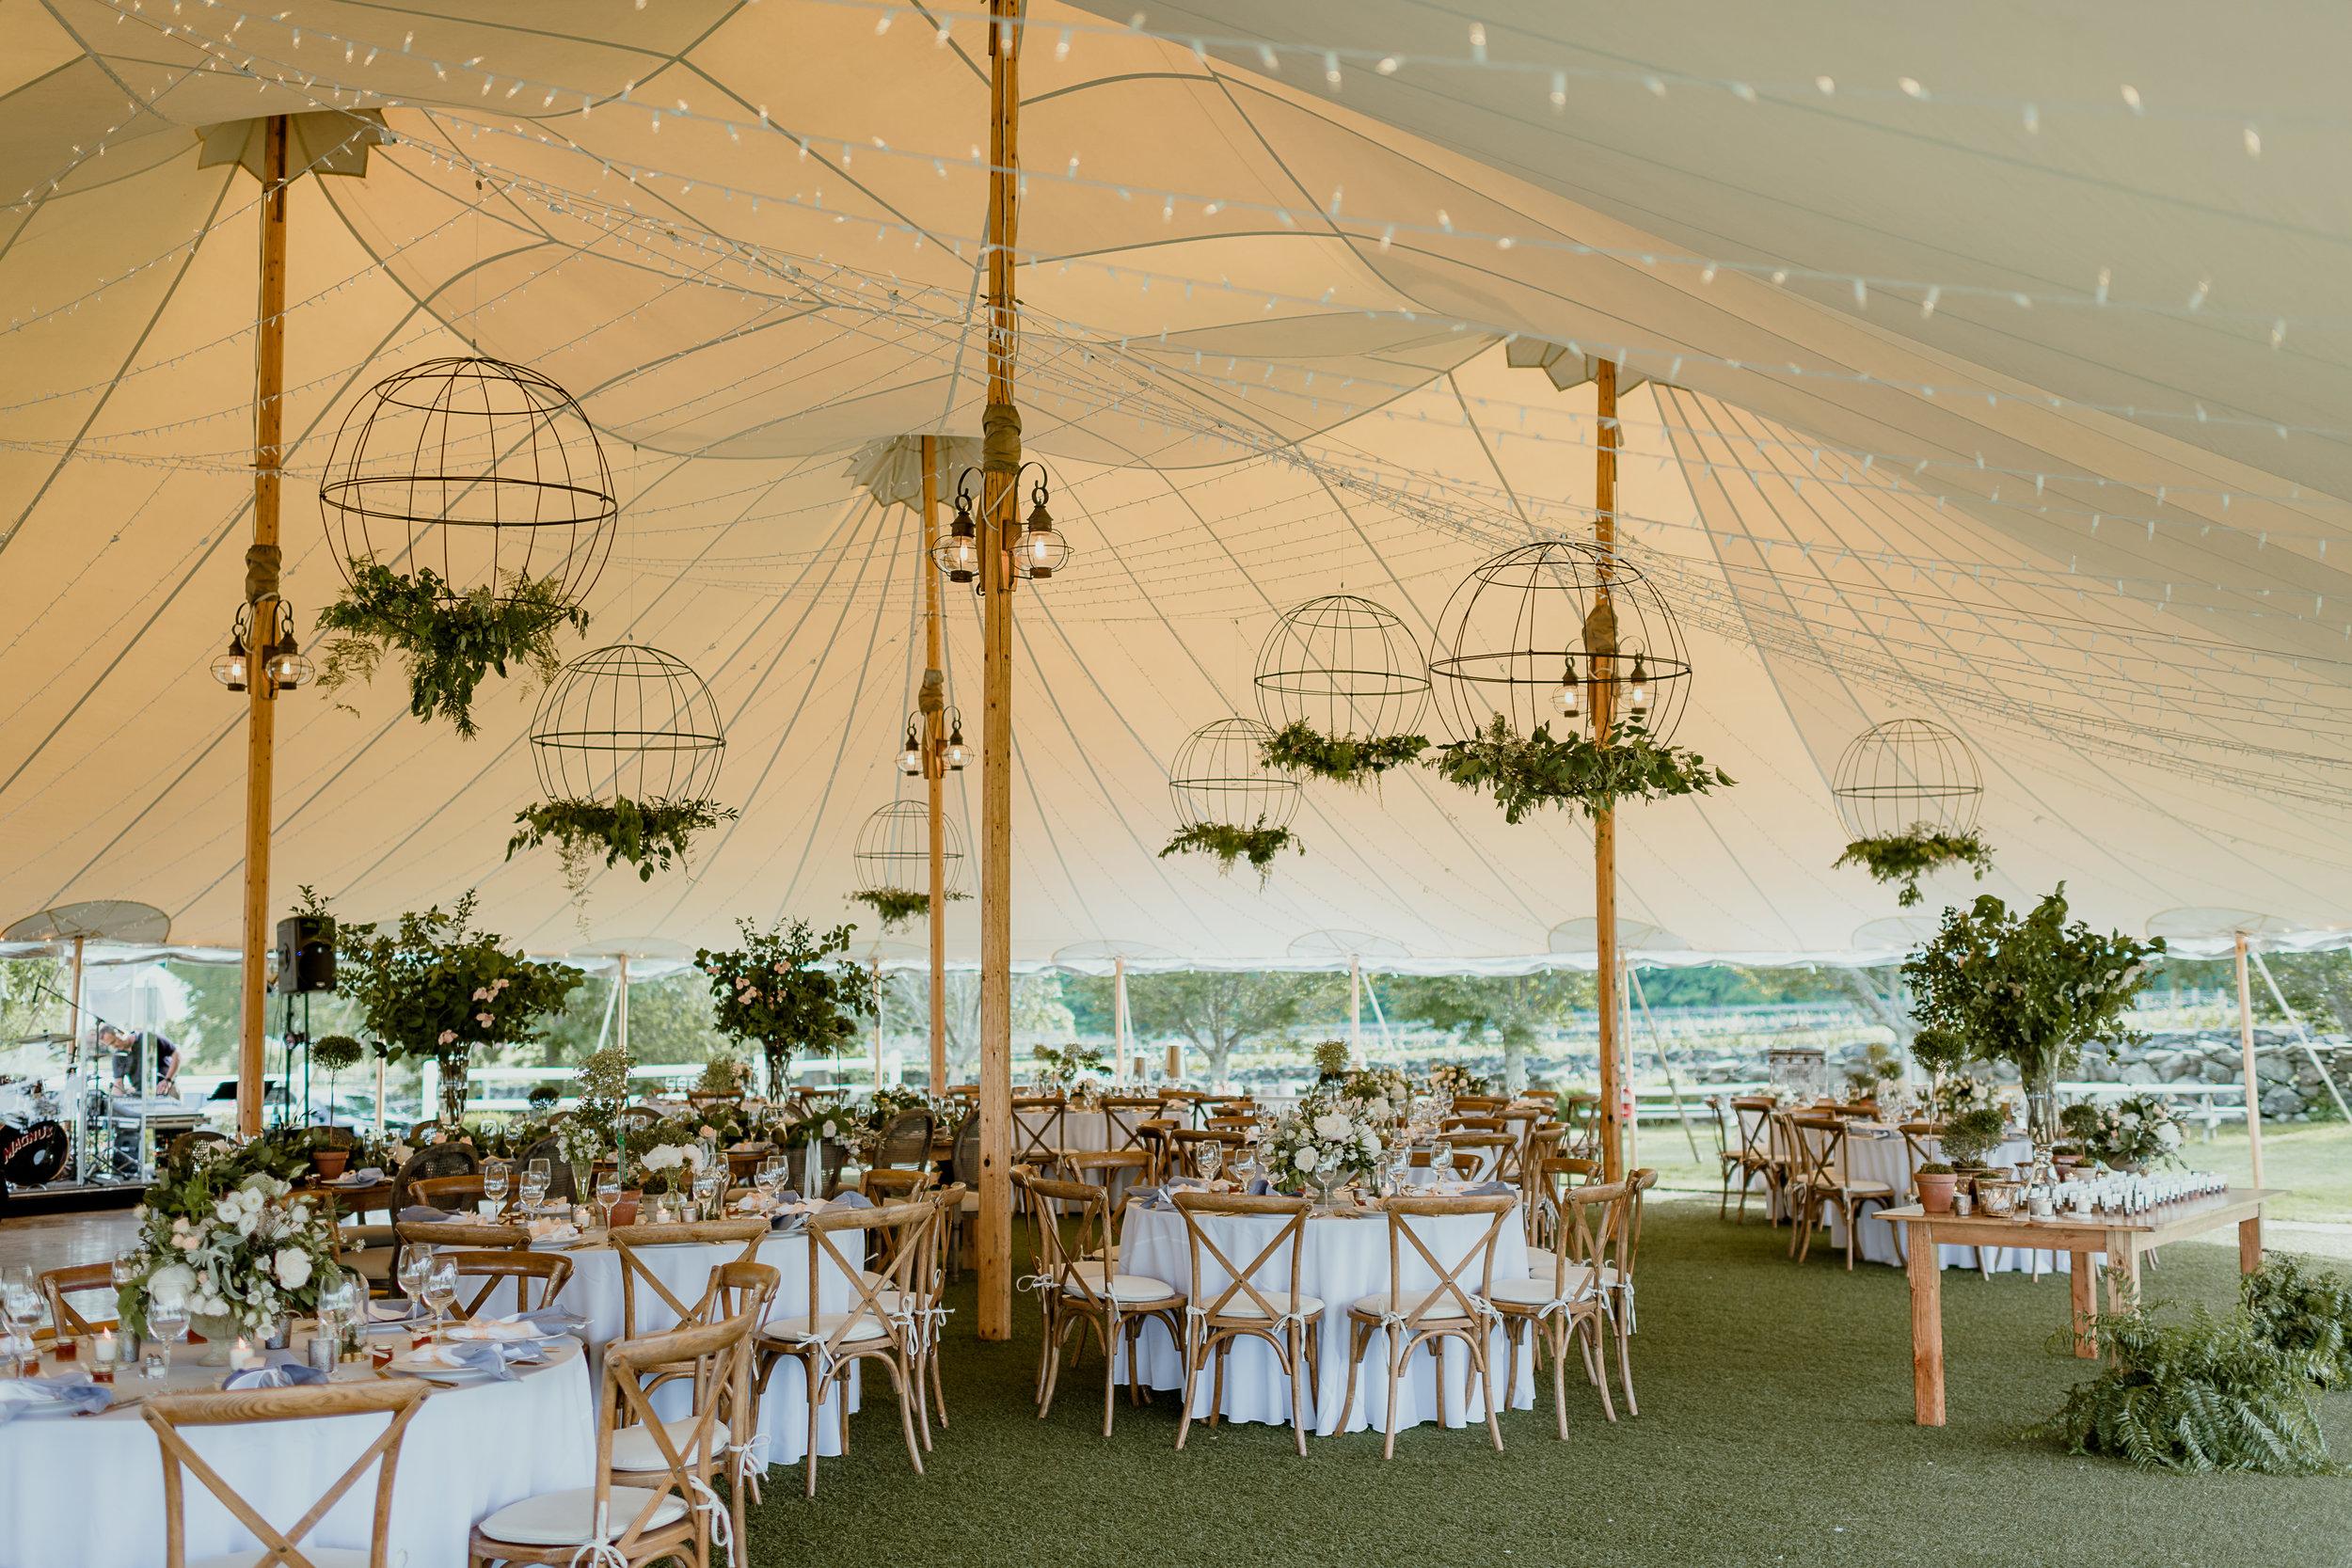 Green & White Wedding Jonathon Edwards Vineyard Wedding0-401.jpg